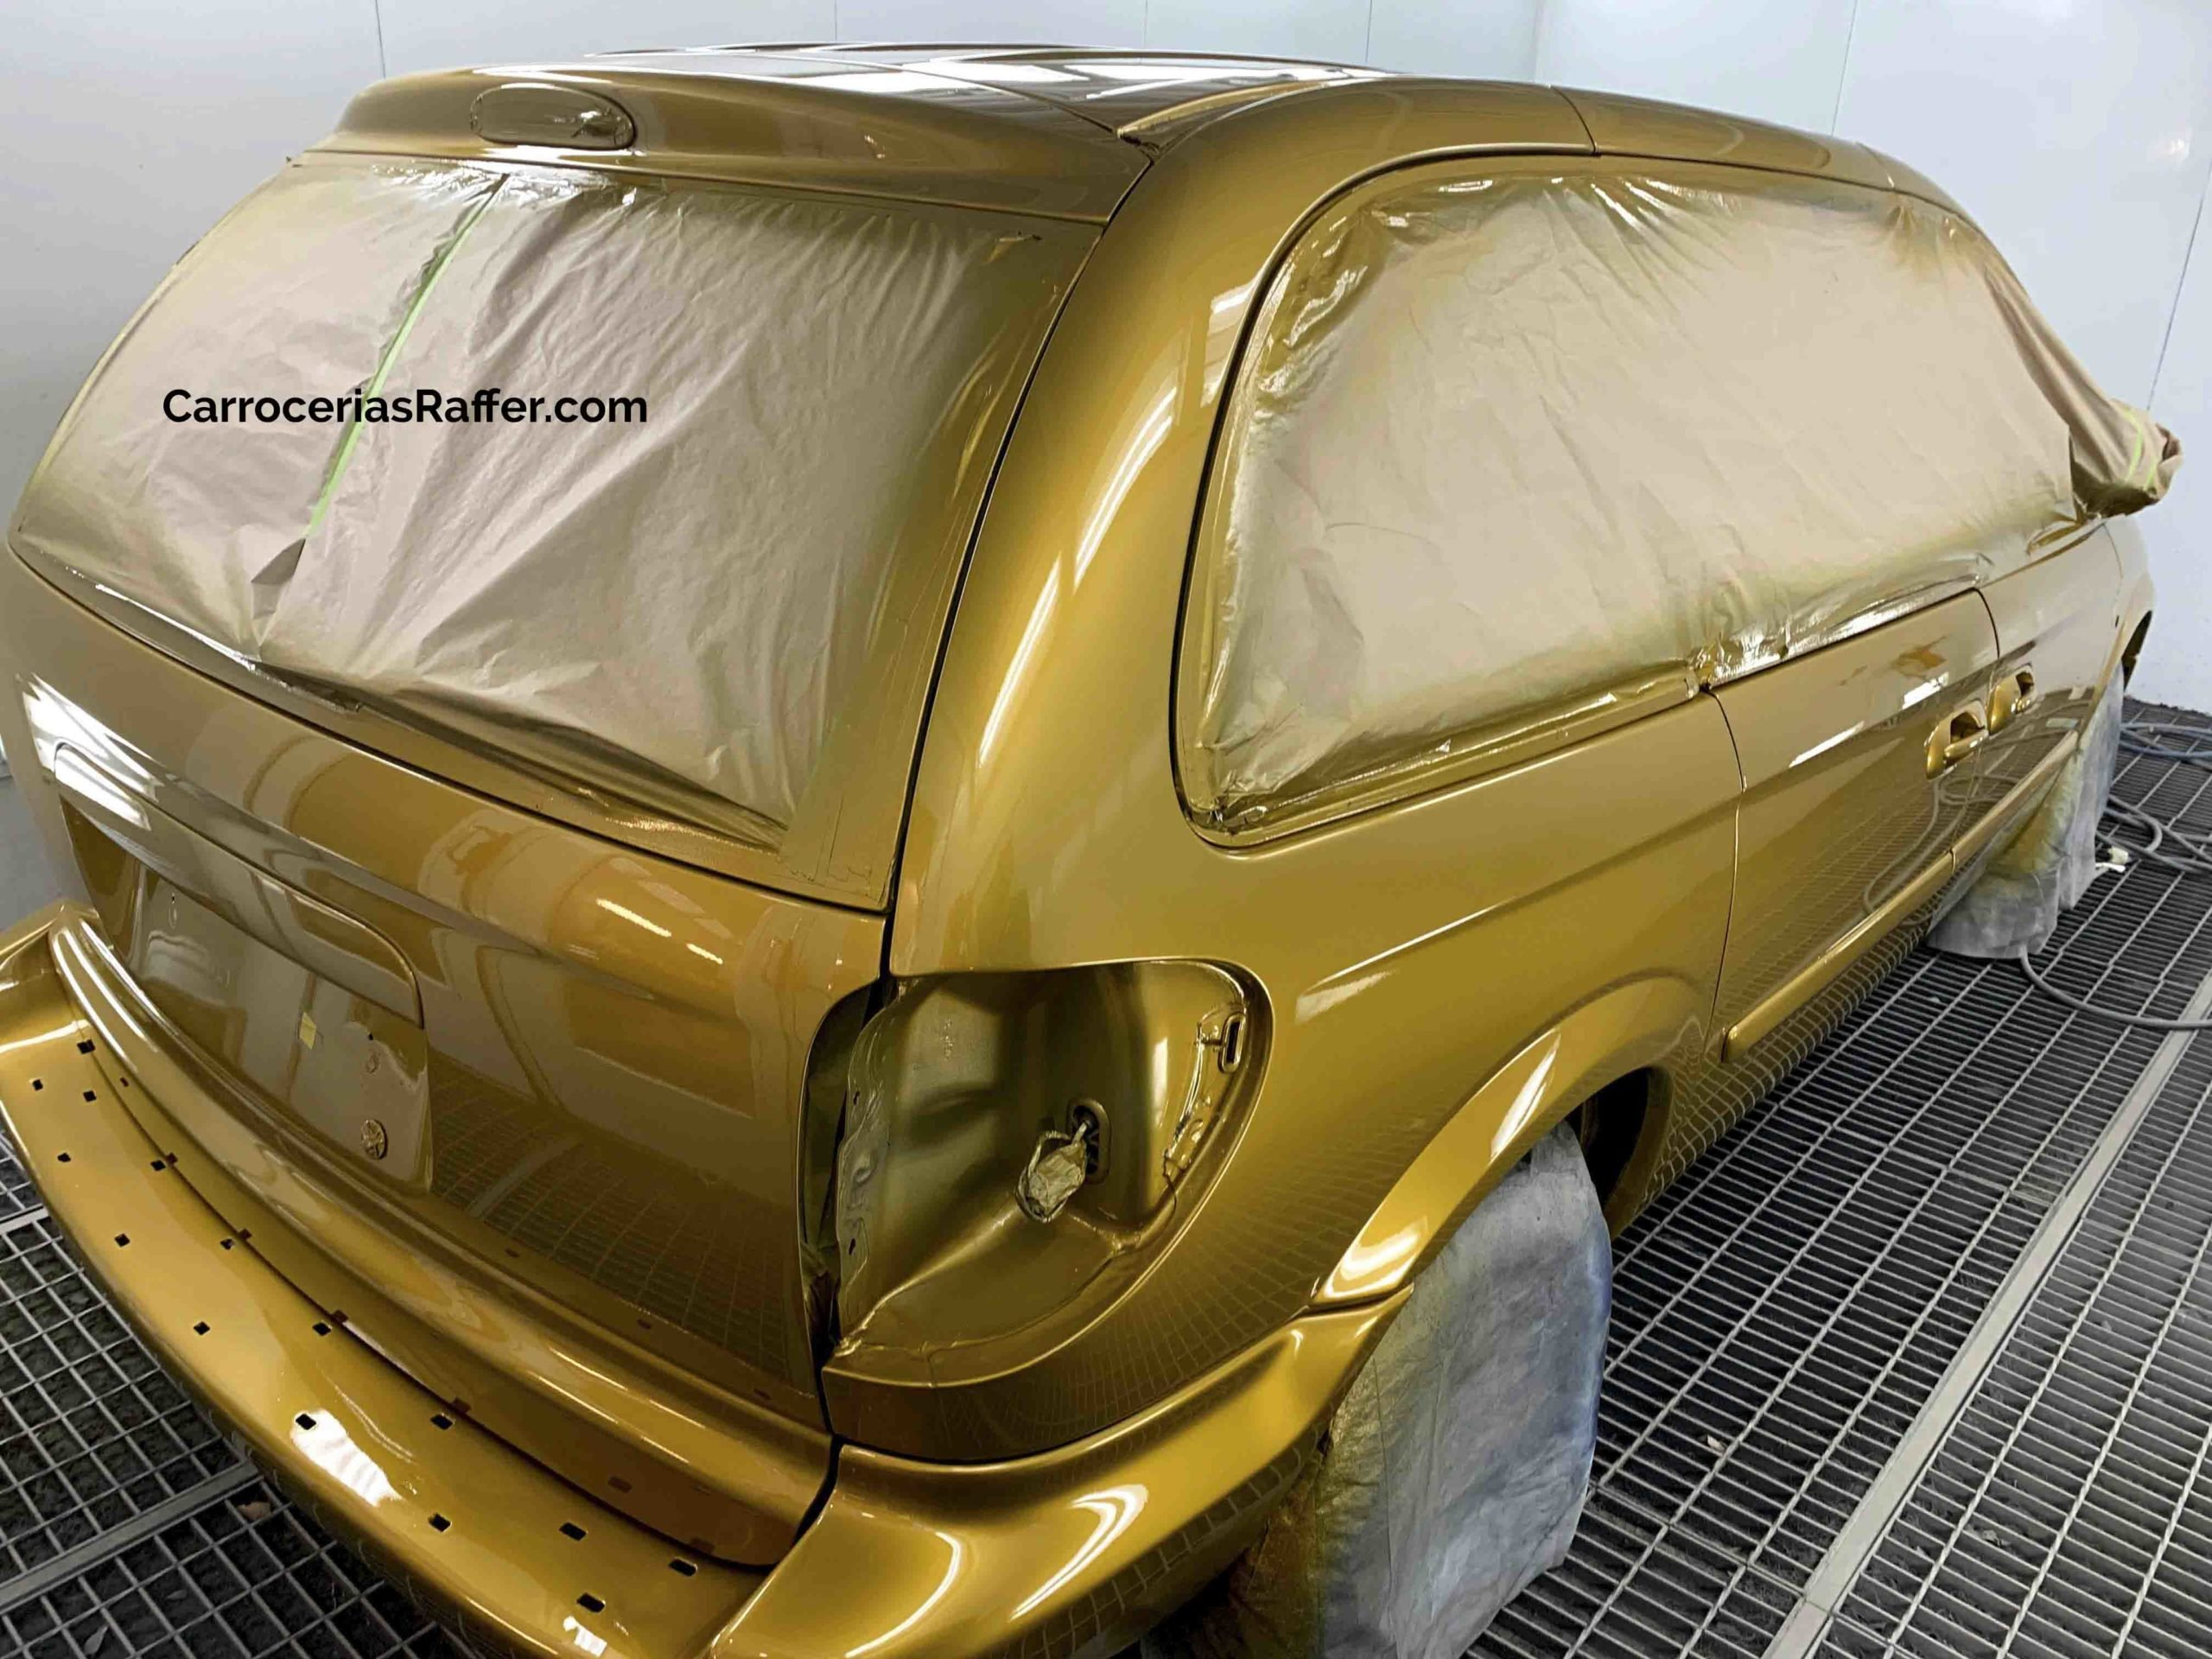 00011 chrysler voyager amarillo curcuma carrocerias raffer pintar furgoneta hernani gipuzkoa donostia san sebastian copia